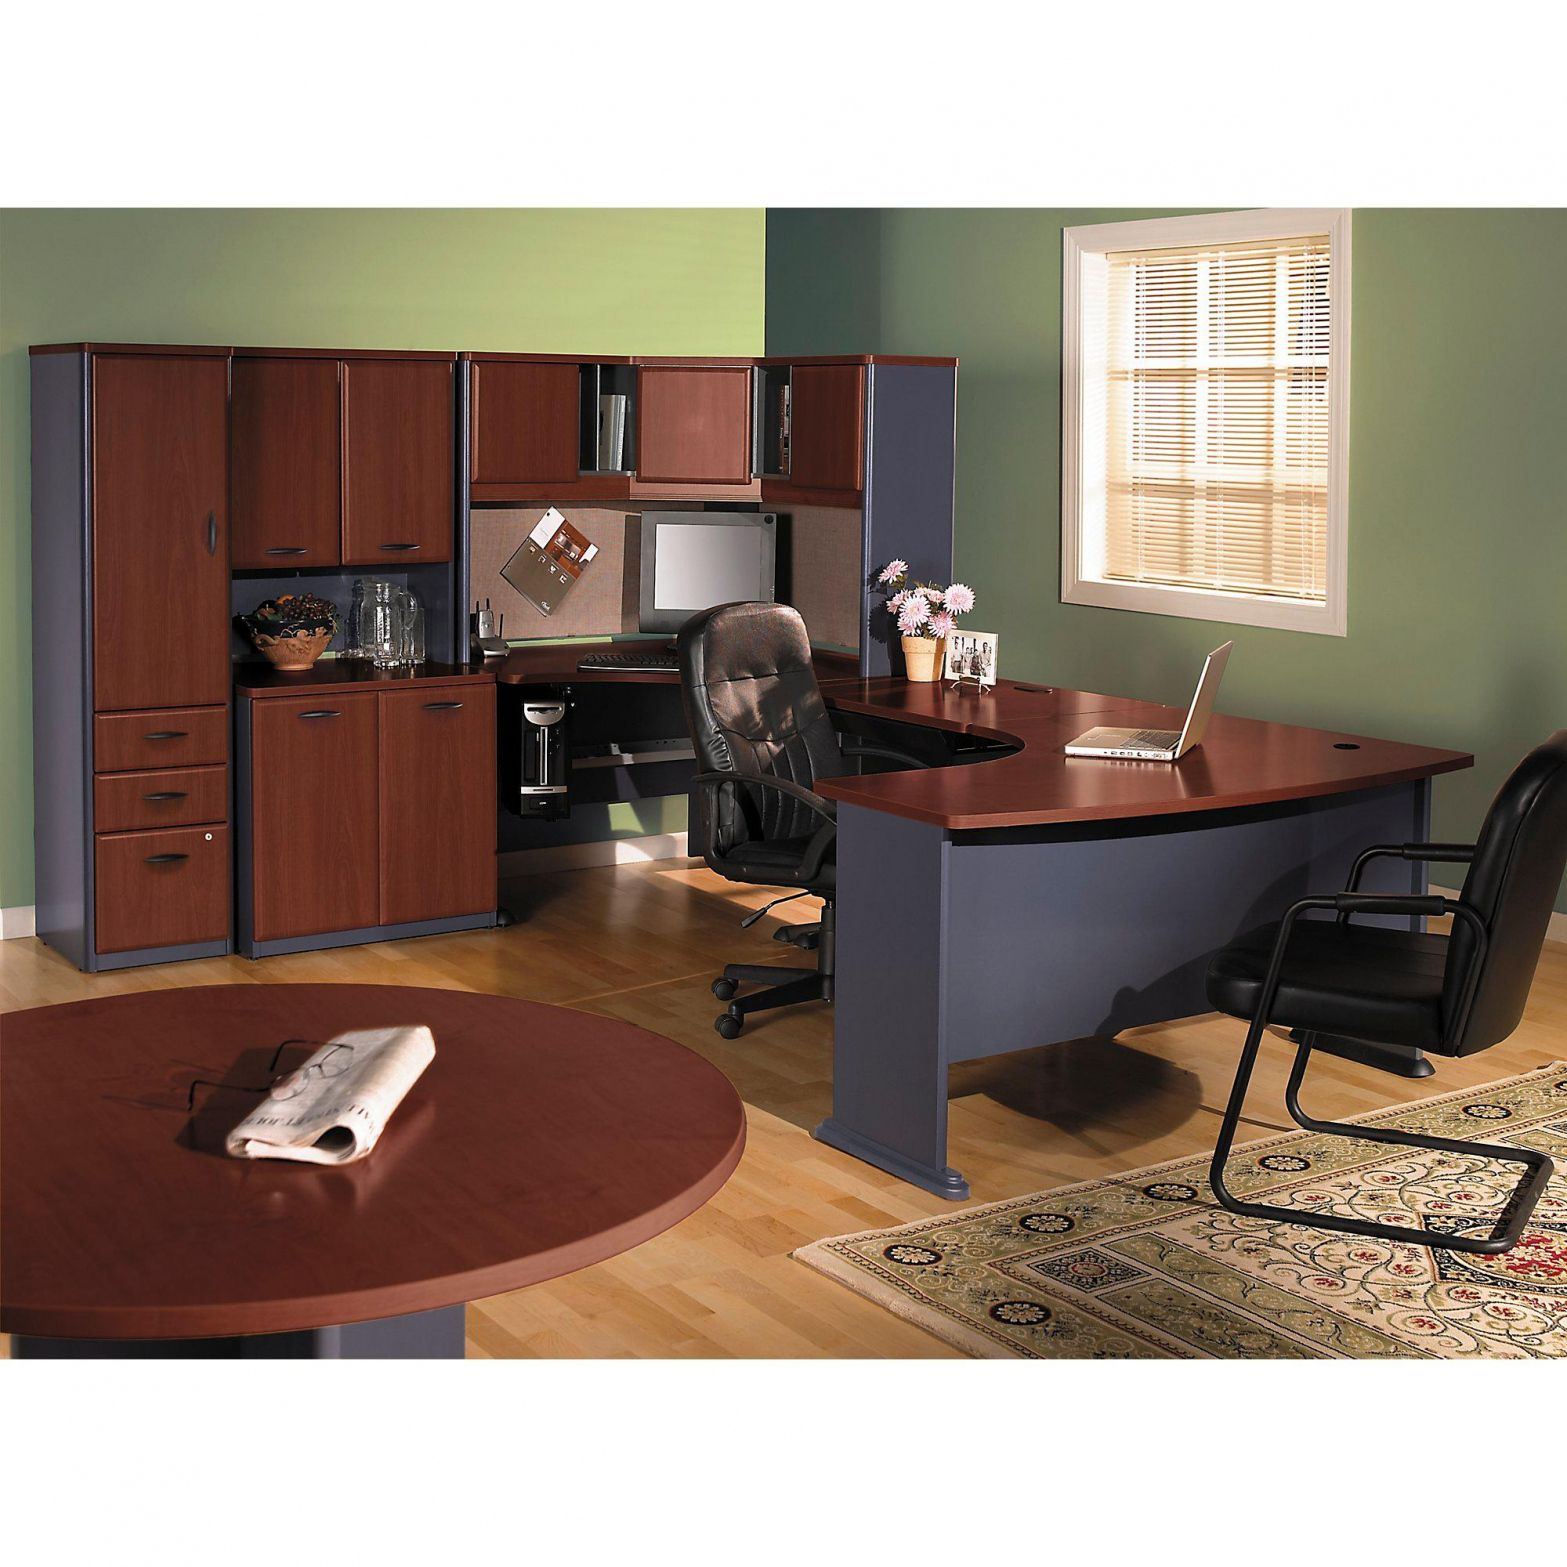 round office desks. 2018 Office Desk With Round Conference End - Home Furniture Set Check More At Http Desks L